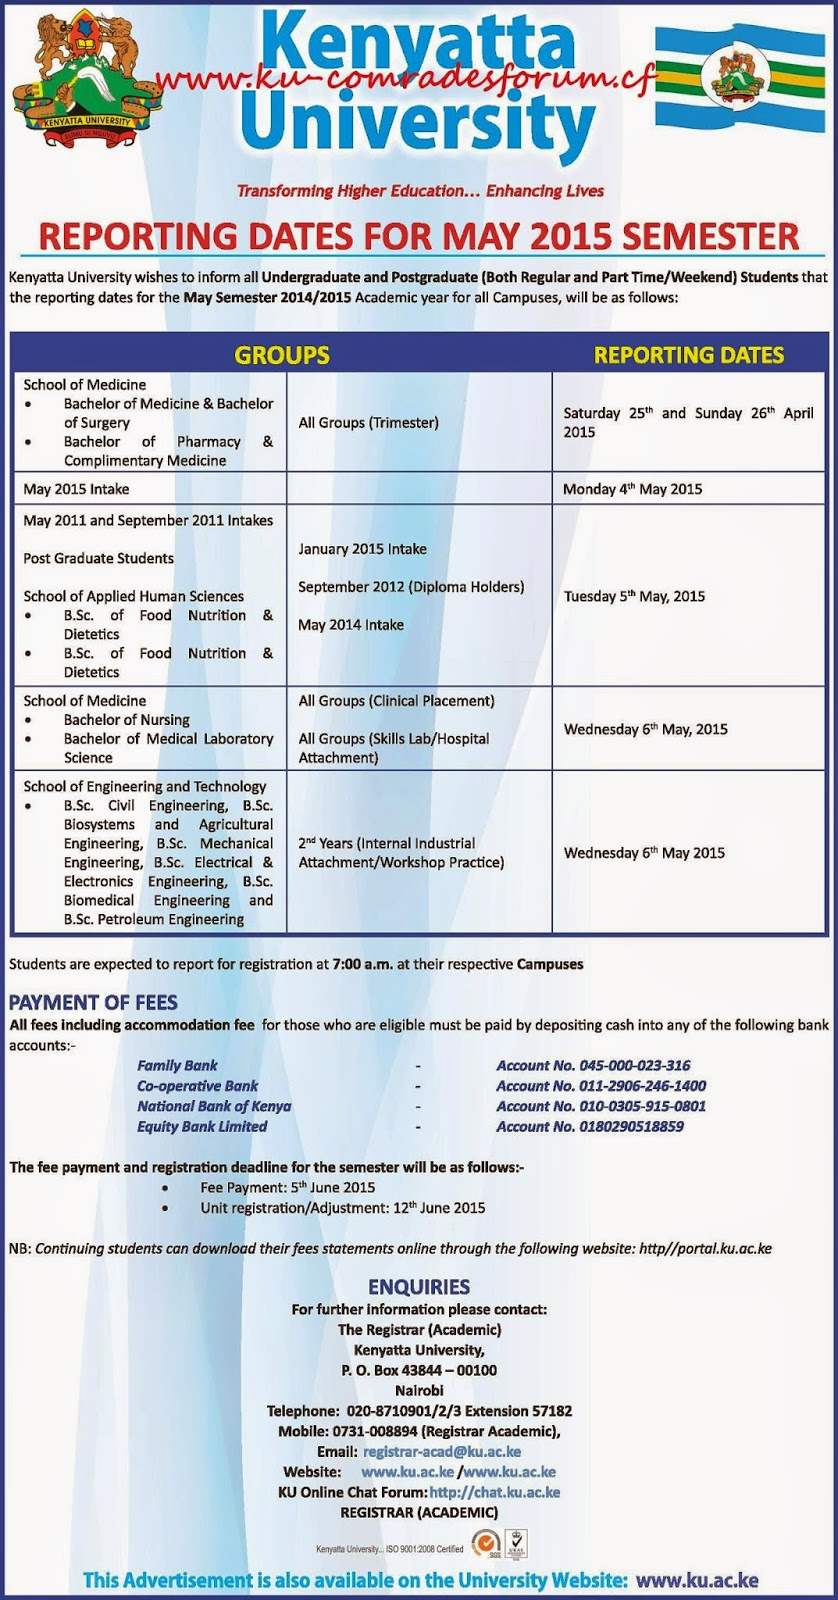 Kenyatta University May Session Reporting Dates | K U - Comrades Forum